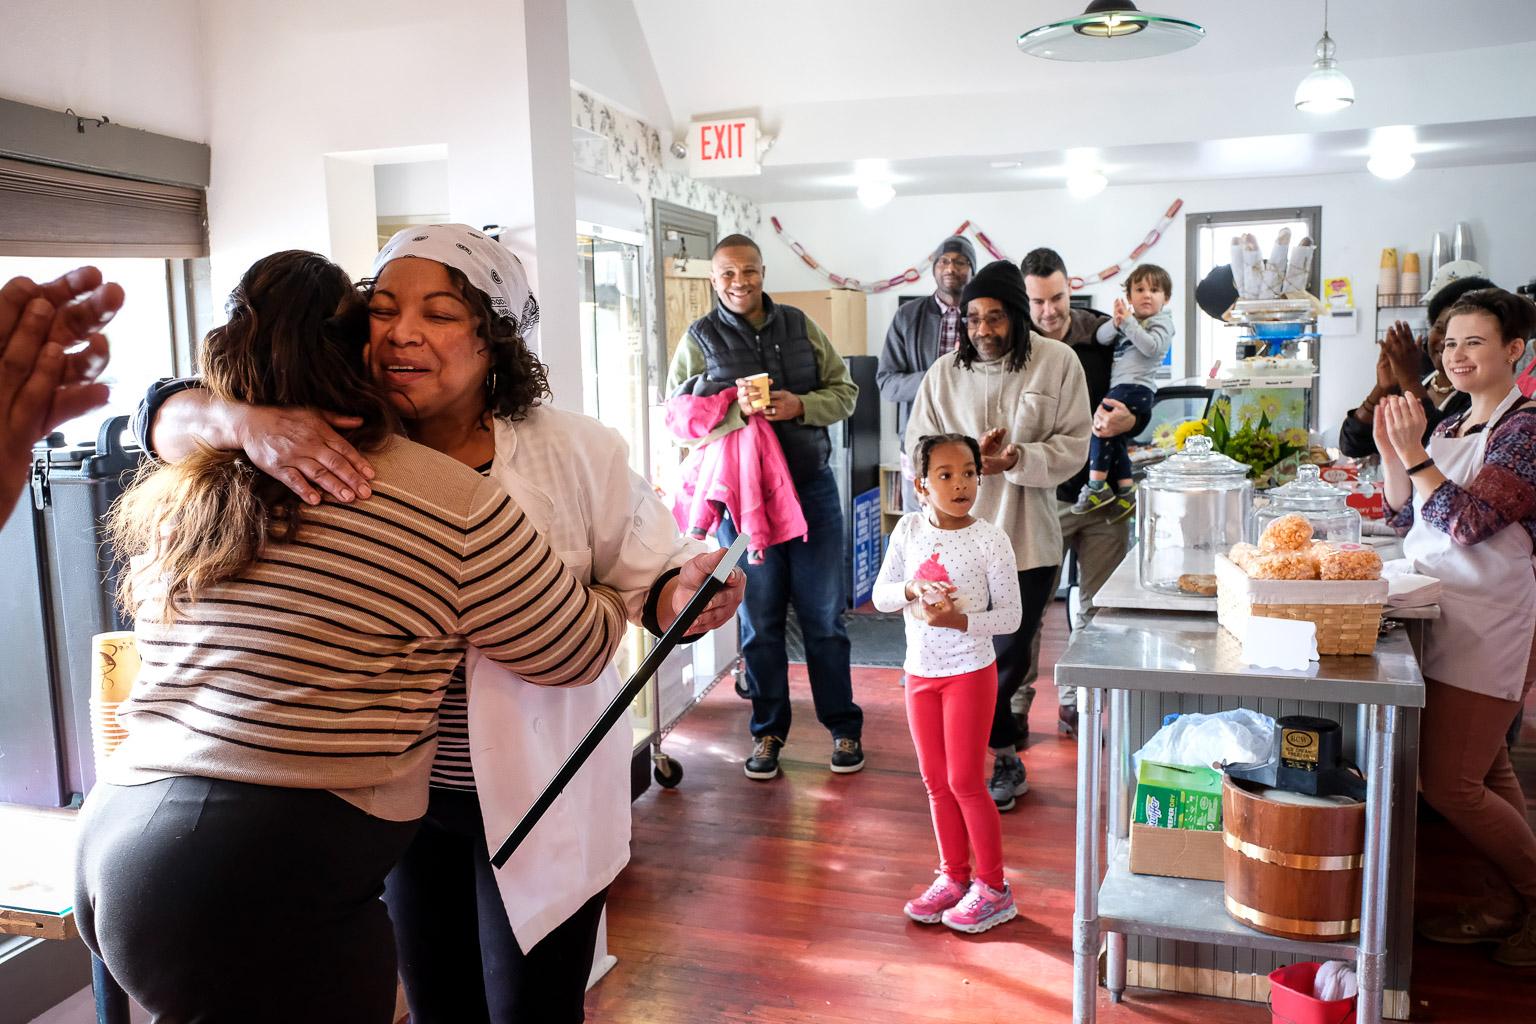 Shortcake_Reopening_11-18-17-073-Lenzy-Ruffin-Event-Photography-Washington-DC-Fuji-X-T2.jpg